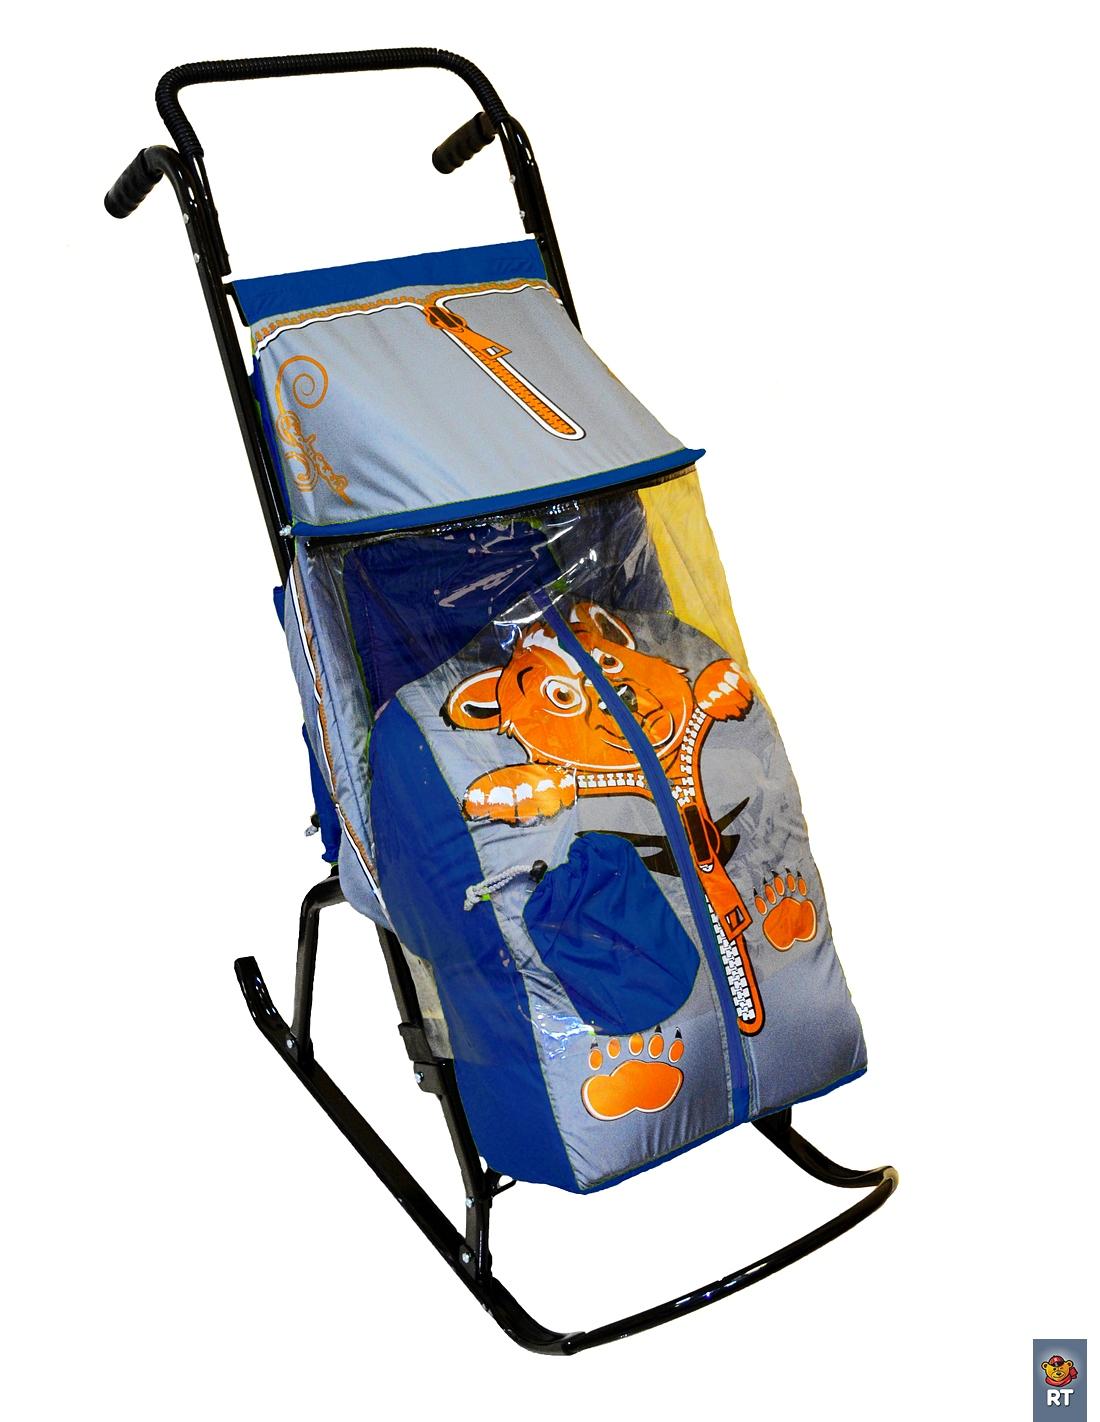 Купить Санки-коляска Снегурочка-2-Р Медвежонок, цвет синий-серый, RT